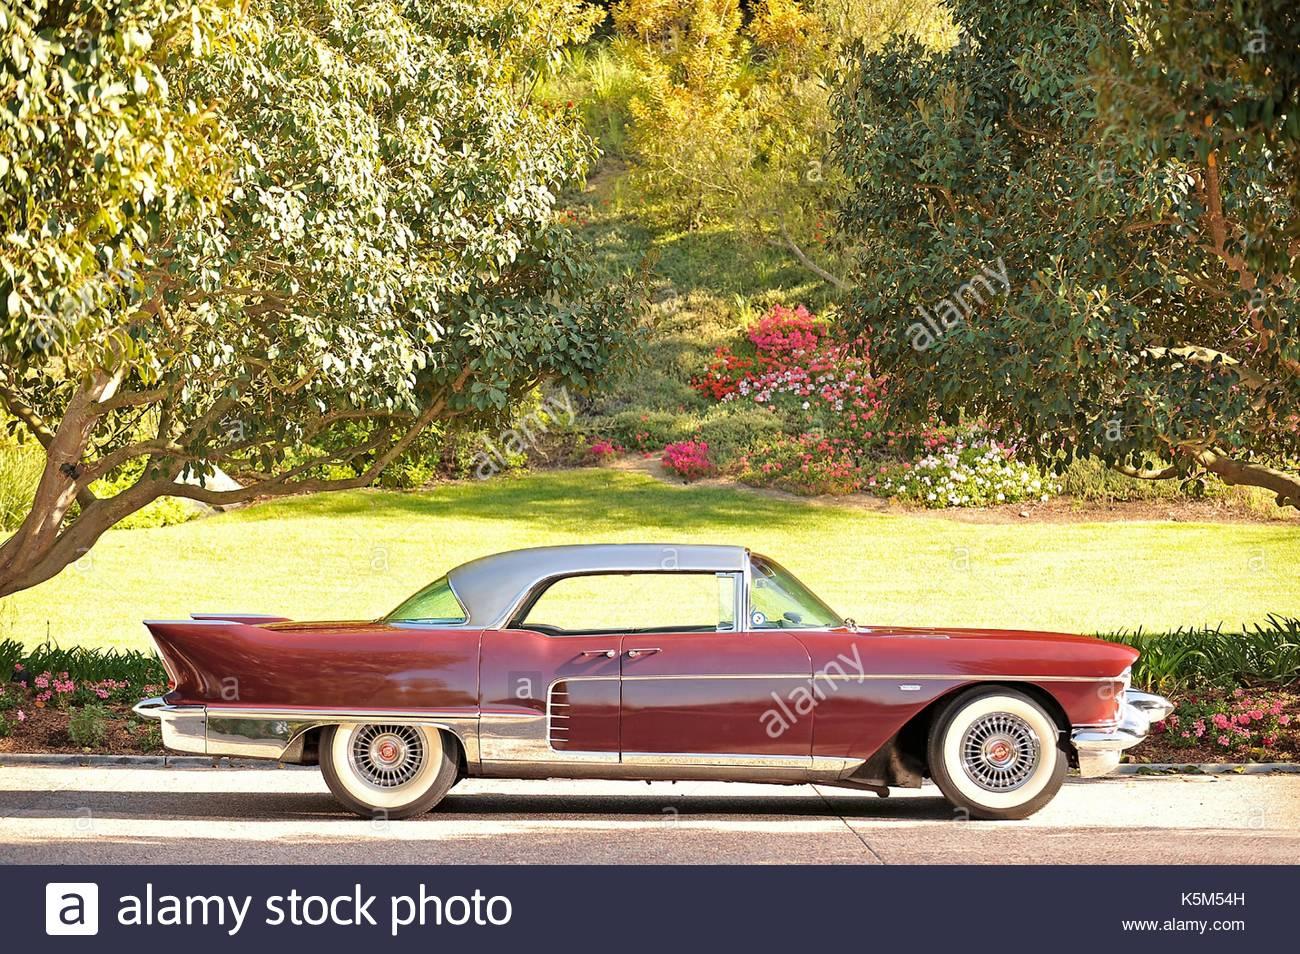 Frank Sinatra S 1958 Cadillac Eldorado Classic Cars Belonging To